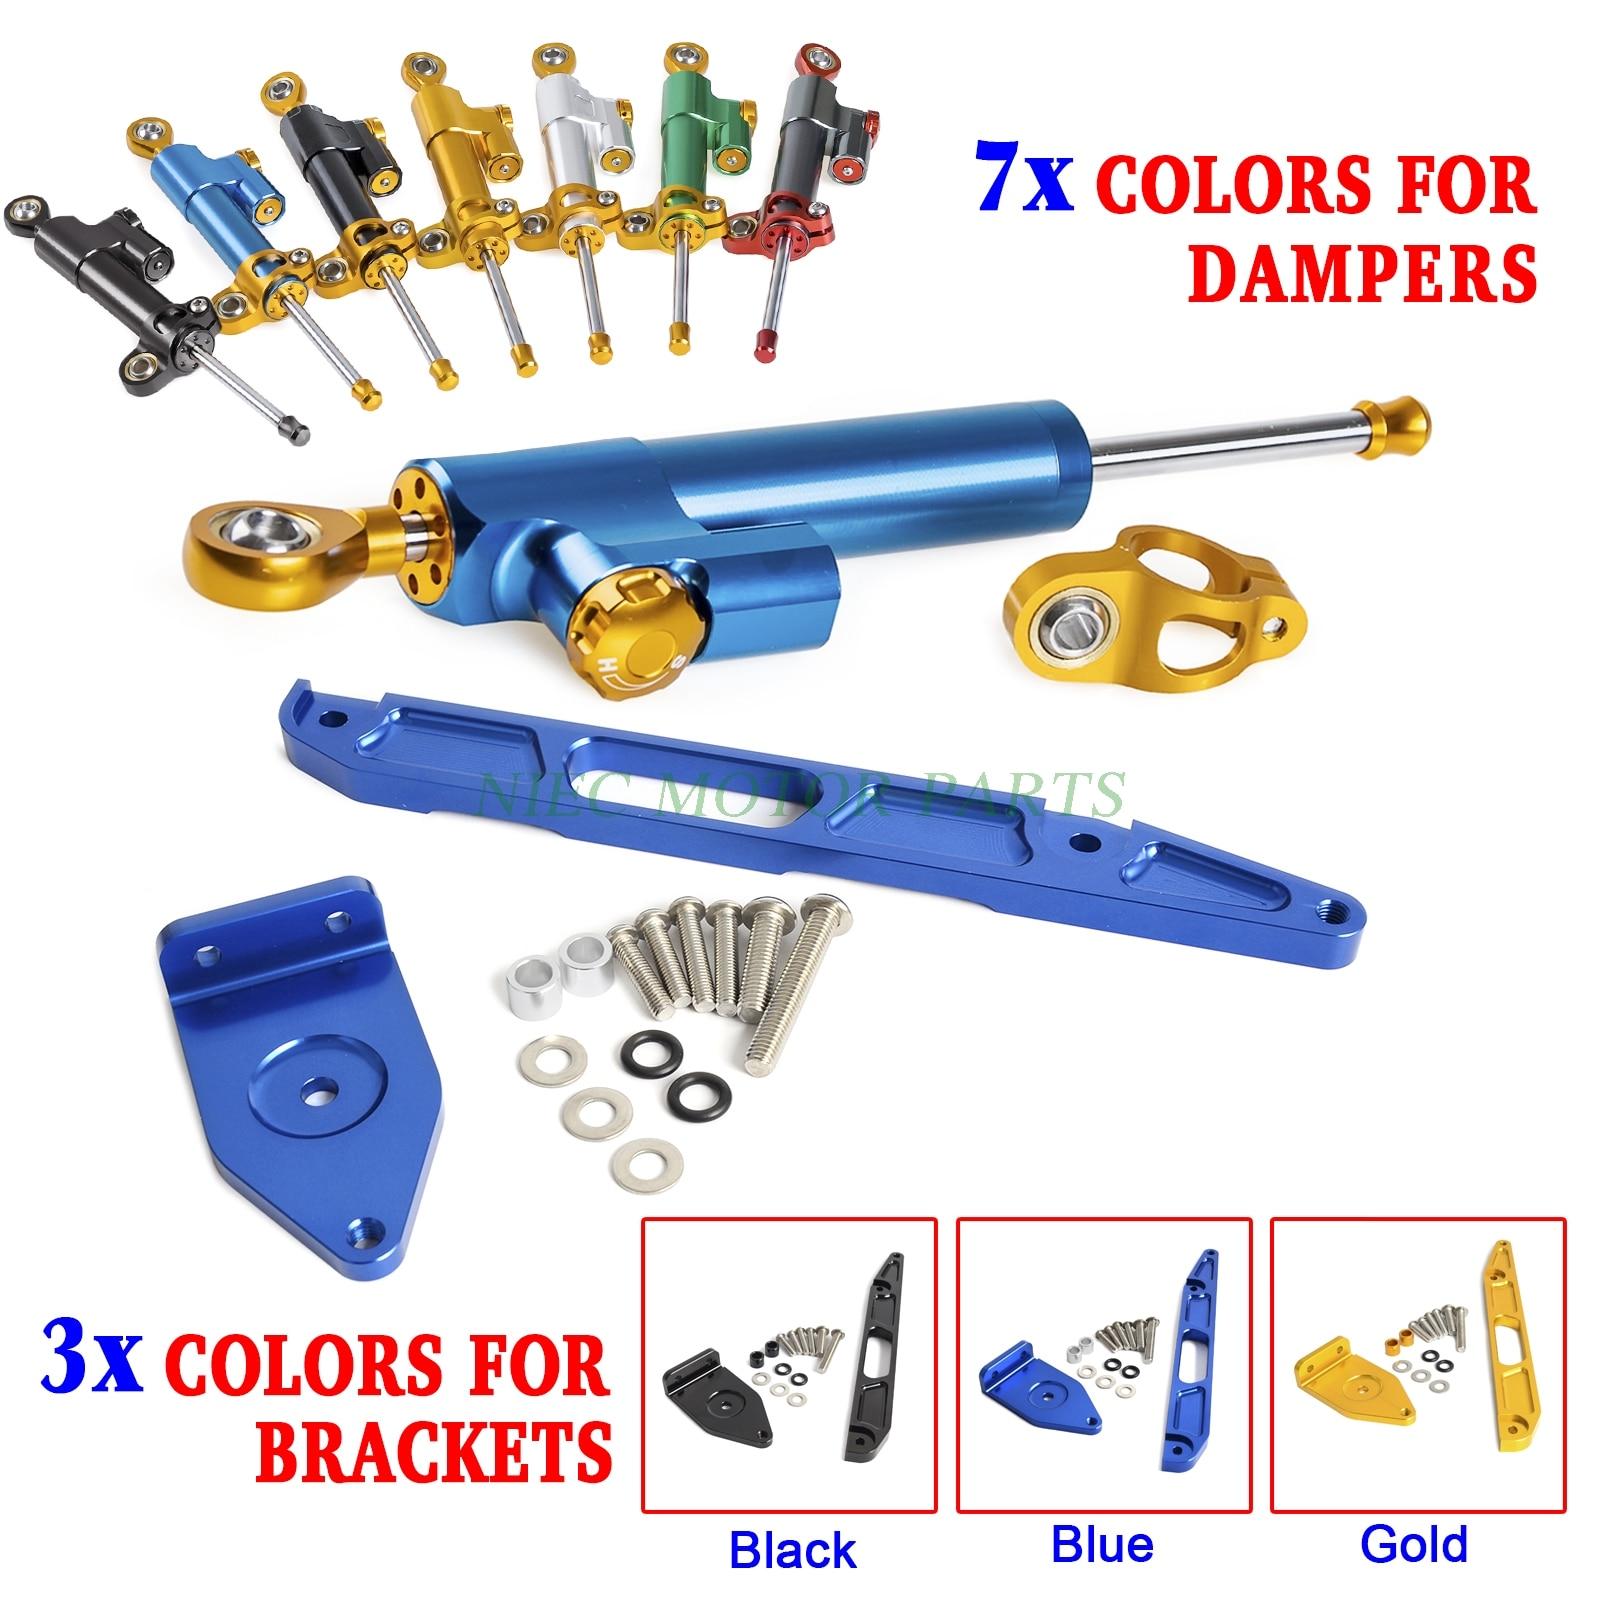 Motorcycle CNC Steering Damper Stabilizer & Bracket For Yamaha  XJR1300 2012 2013 2014 2015 cnc steering damper mounting kit bracket for yamaha xjr1300 2002 2015 2004 2006 2008 2010 2012 2014 xjr 1300 new